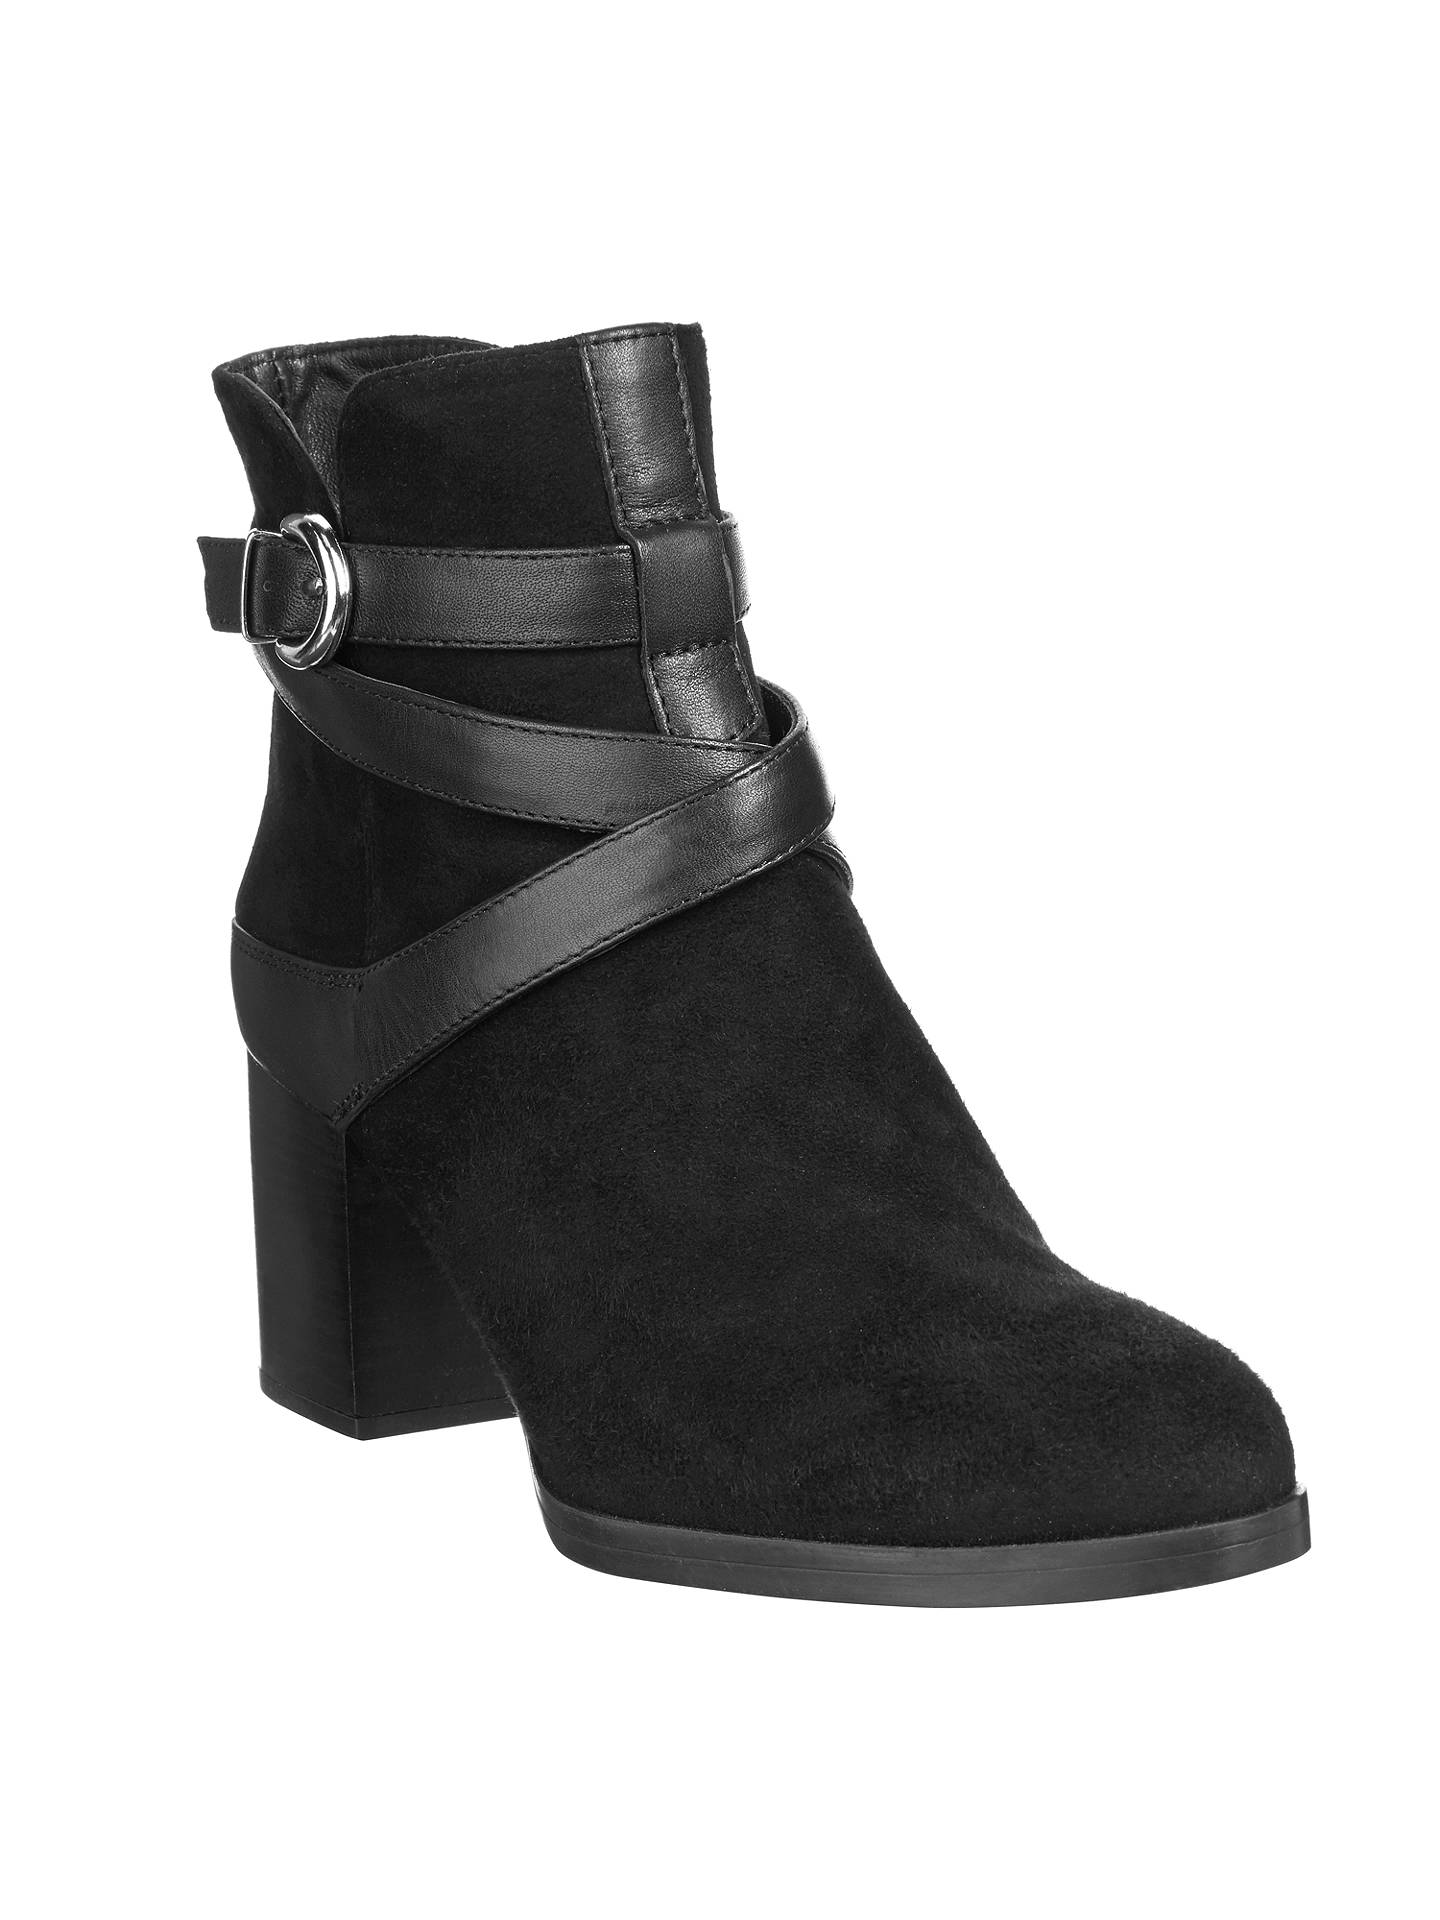 459a97061 Buy Unisa Micael Block Heeled Ankle Boots, Black, 4 Online at johnlewis.com  ...